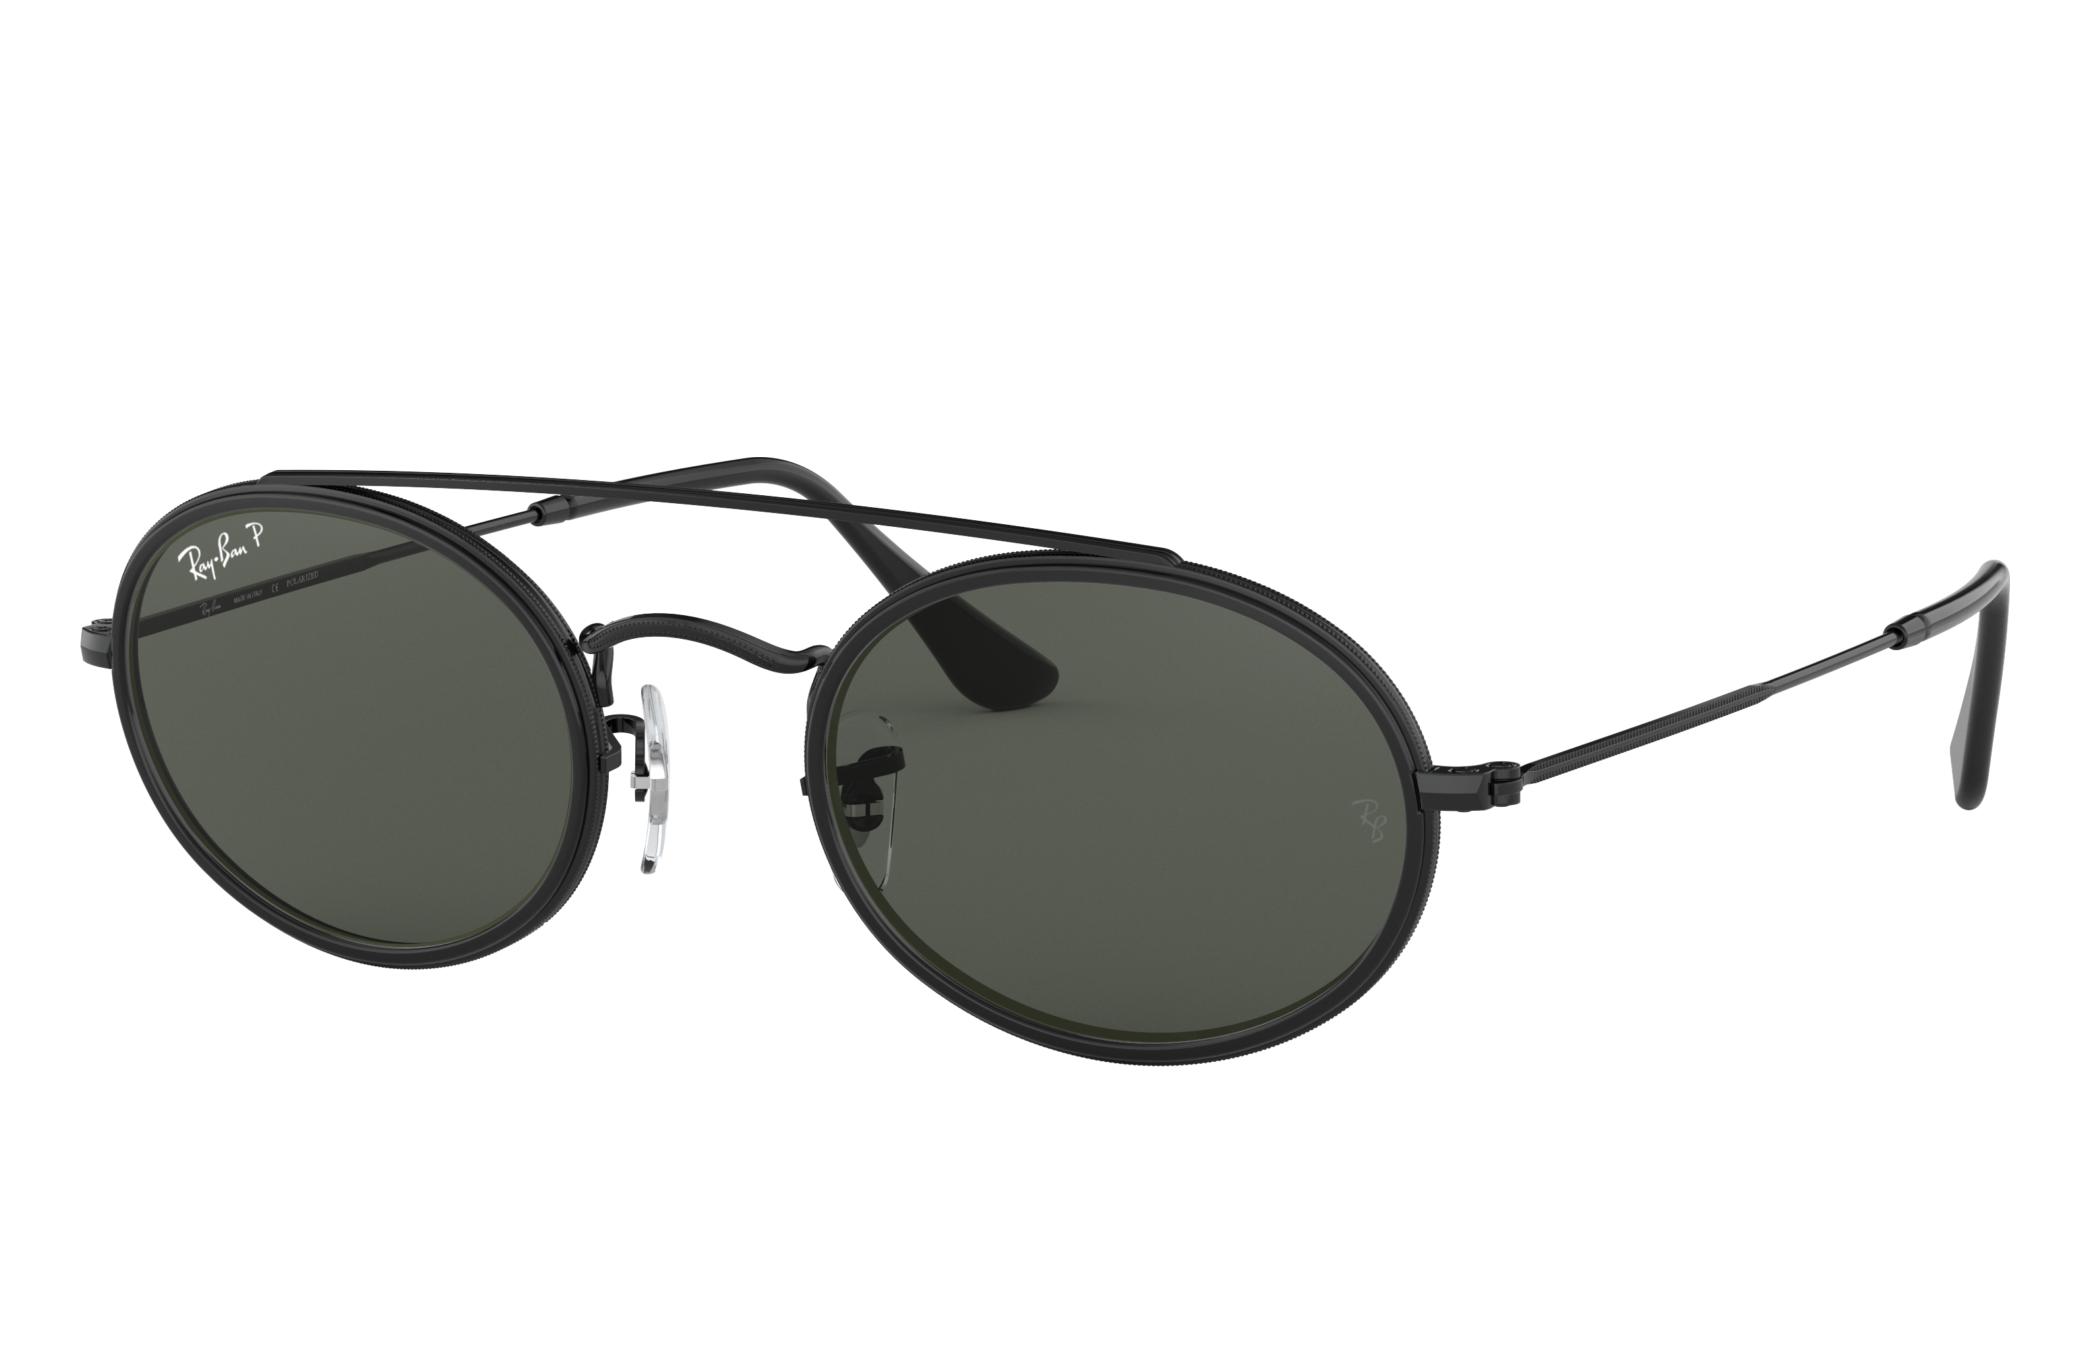 Ray-Ban Oval Double Bridge Black, Polarized Green Lenses - RB3847N